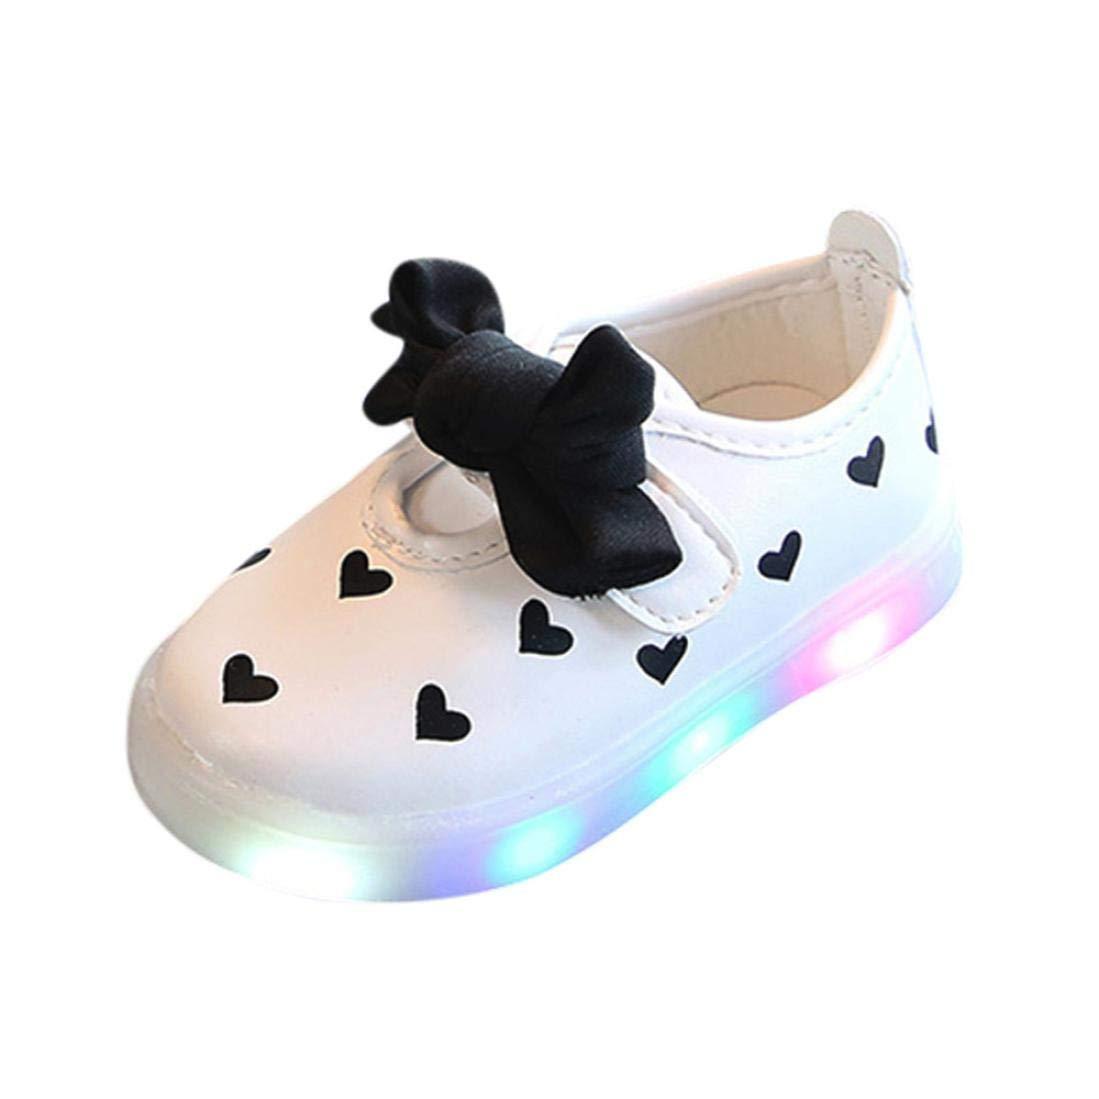 Robemon Toddler Kids Skate Chaussures Childs Bébé Chaussures LED Light Up Luminous Sneakers